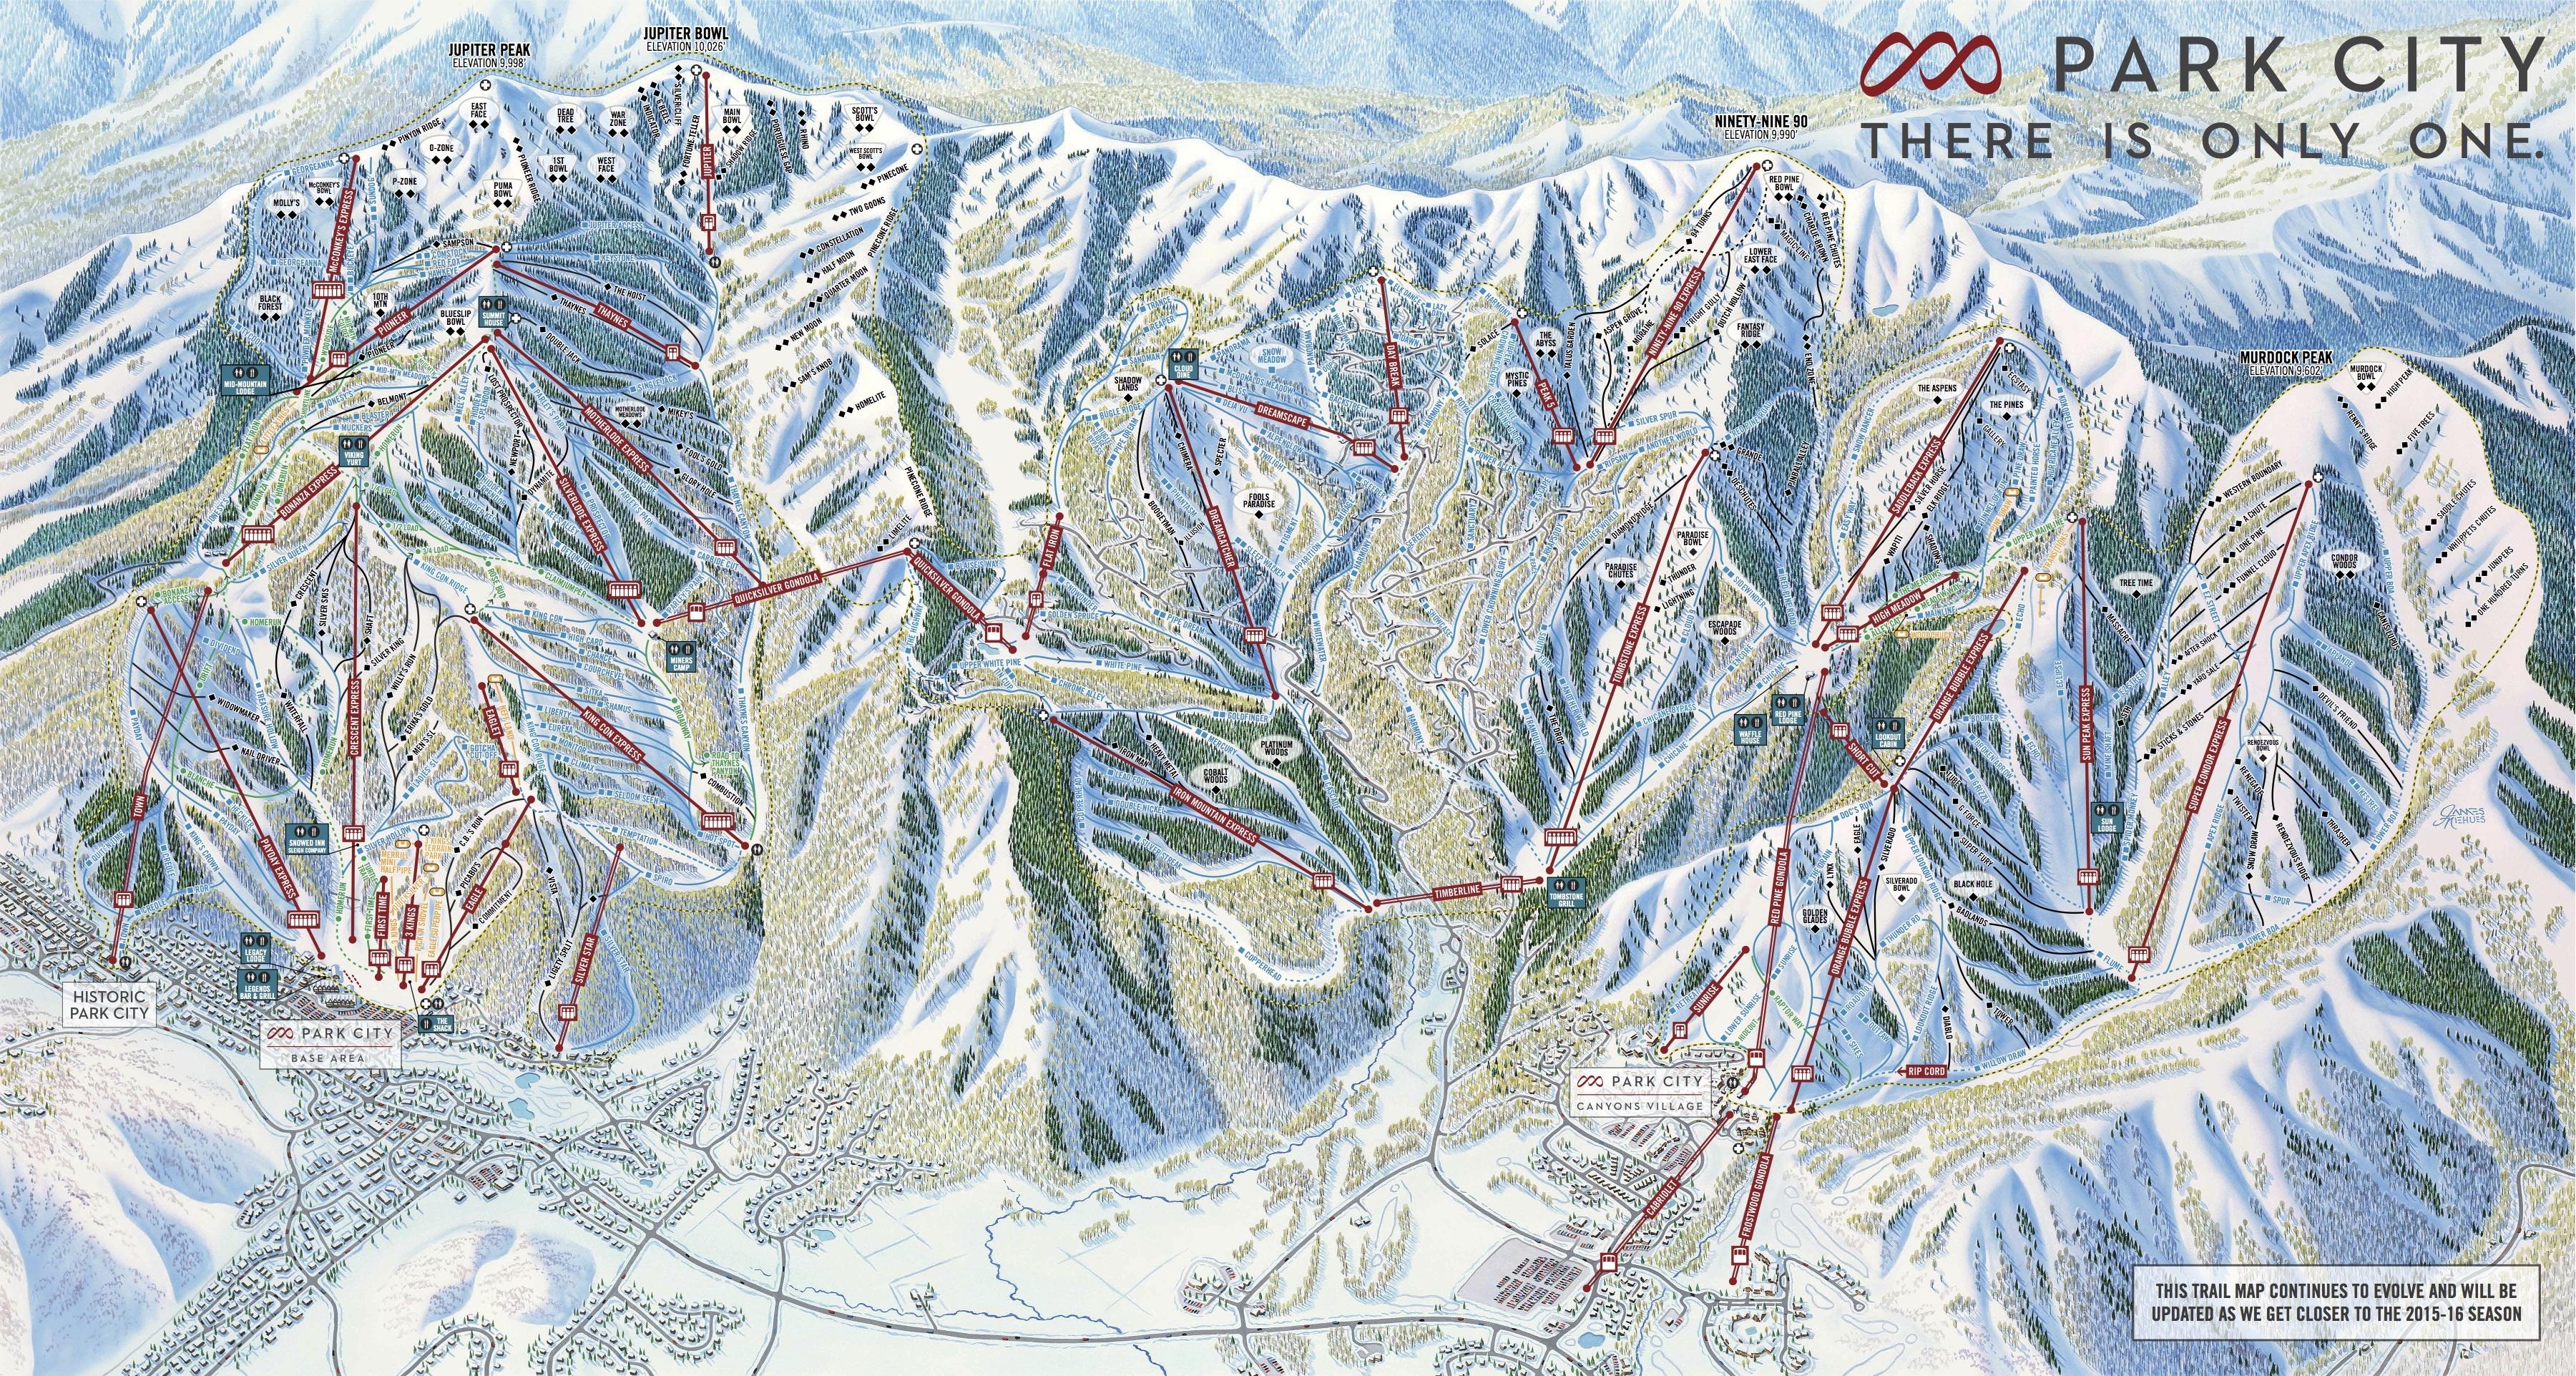 Map Of Park City Park City Mountain Resort Night Skiing Map Of Utah